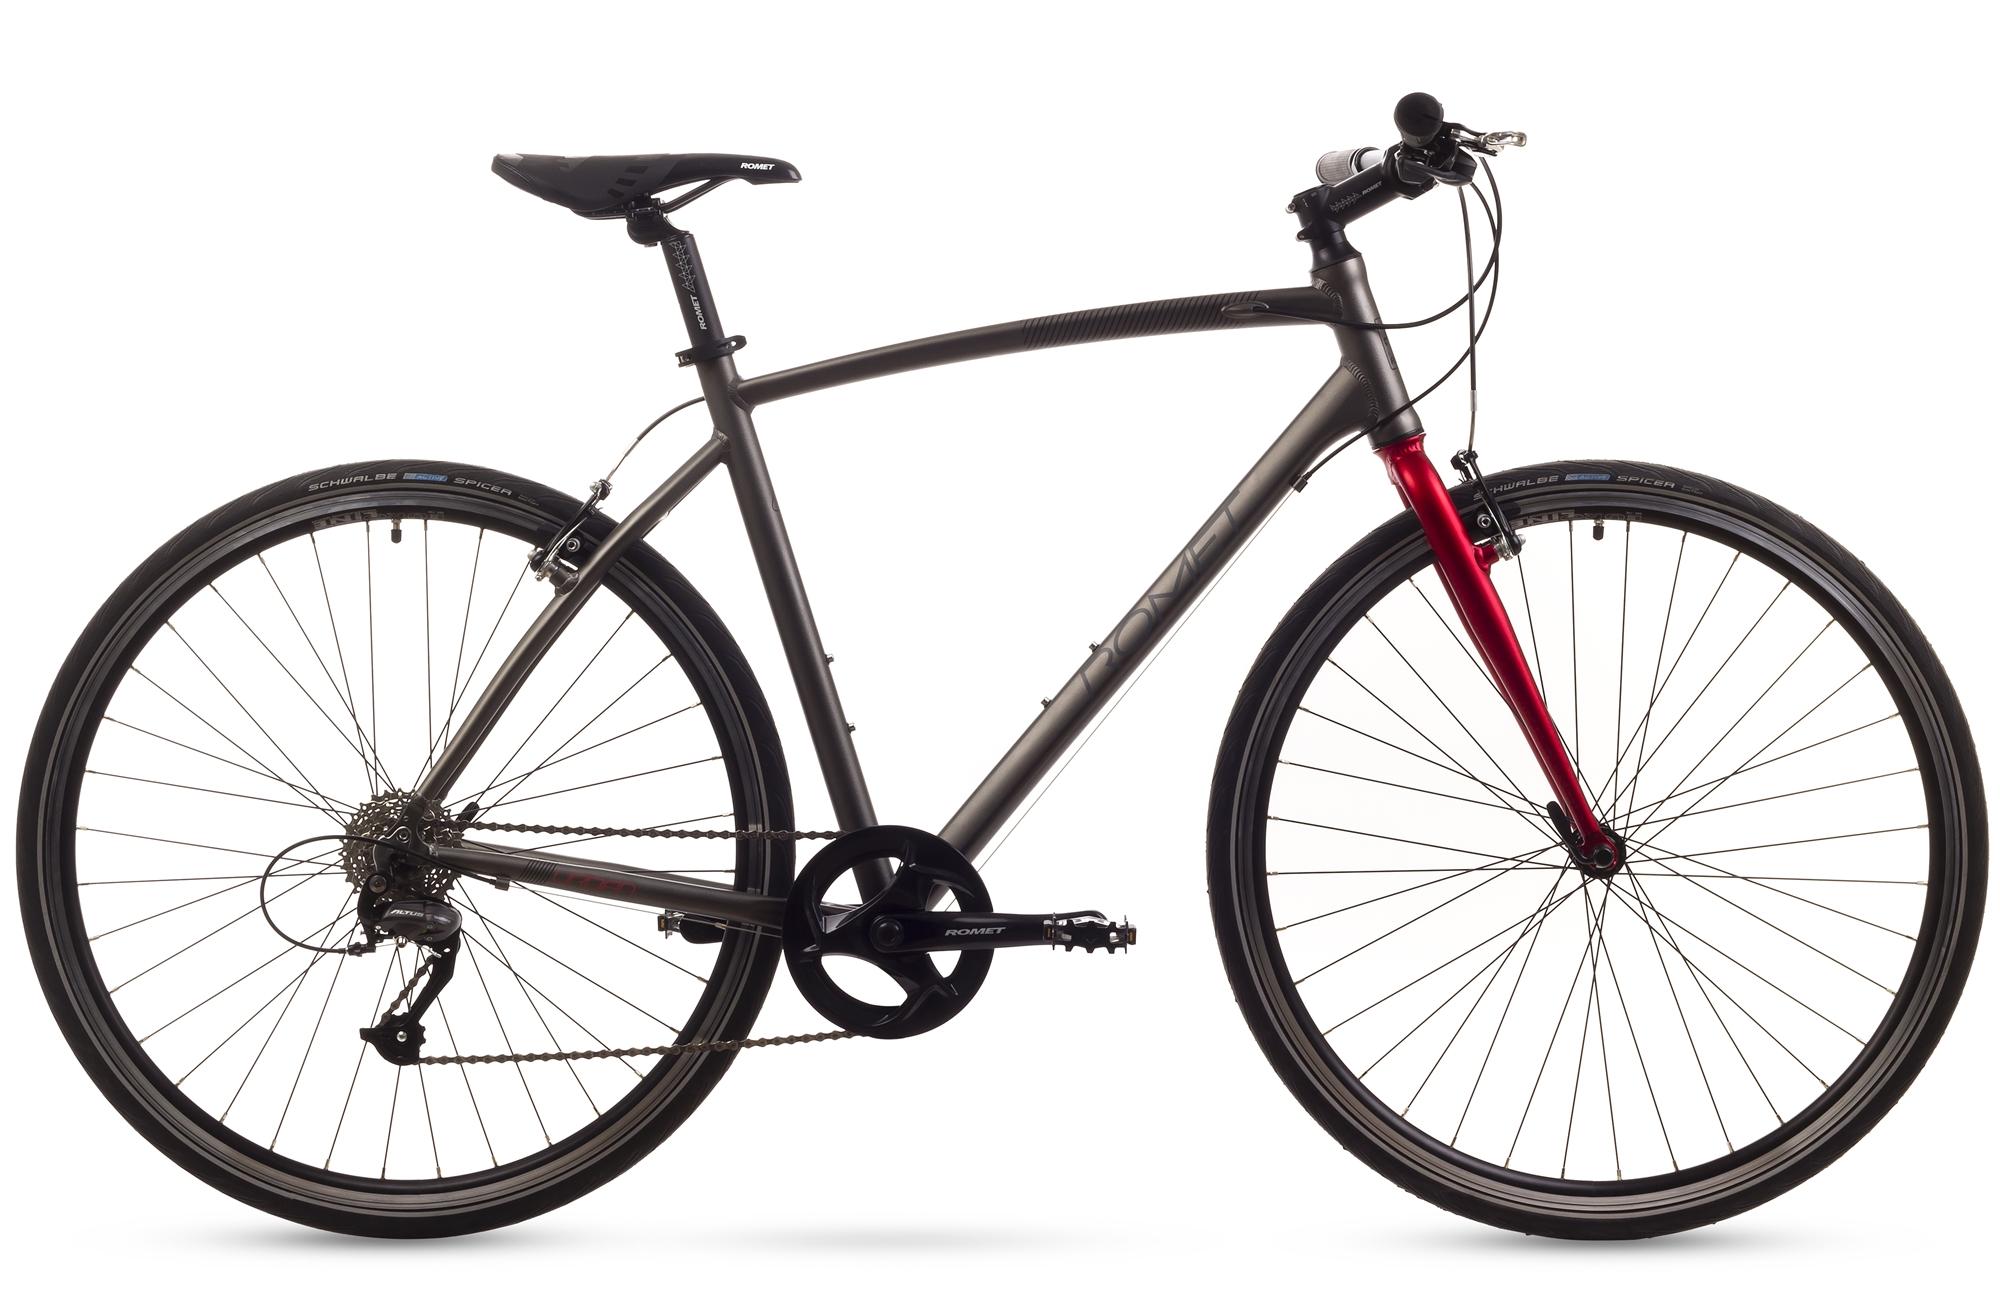 Rower Romet Mistral Urban 28 rama 23' XL City 2016